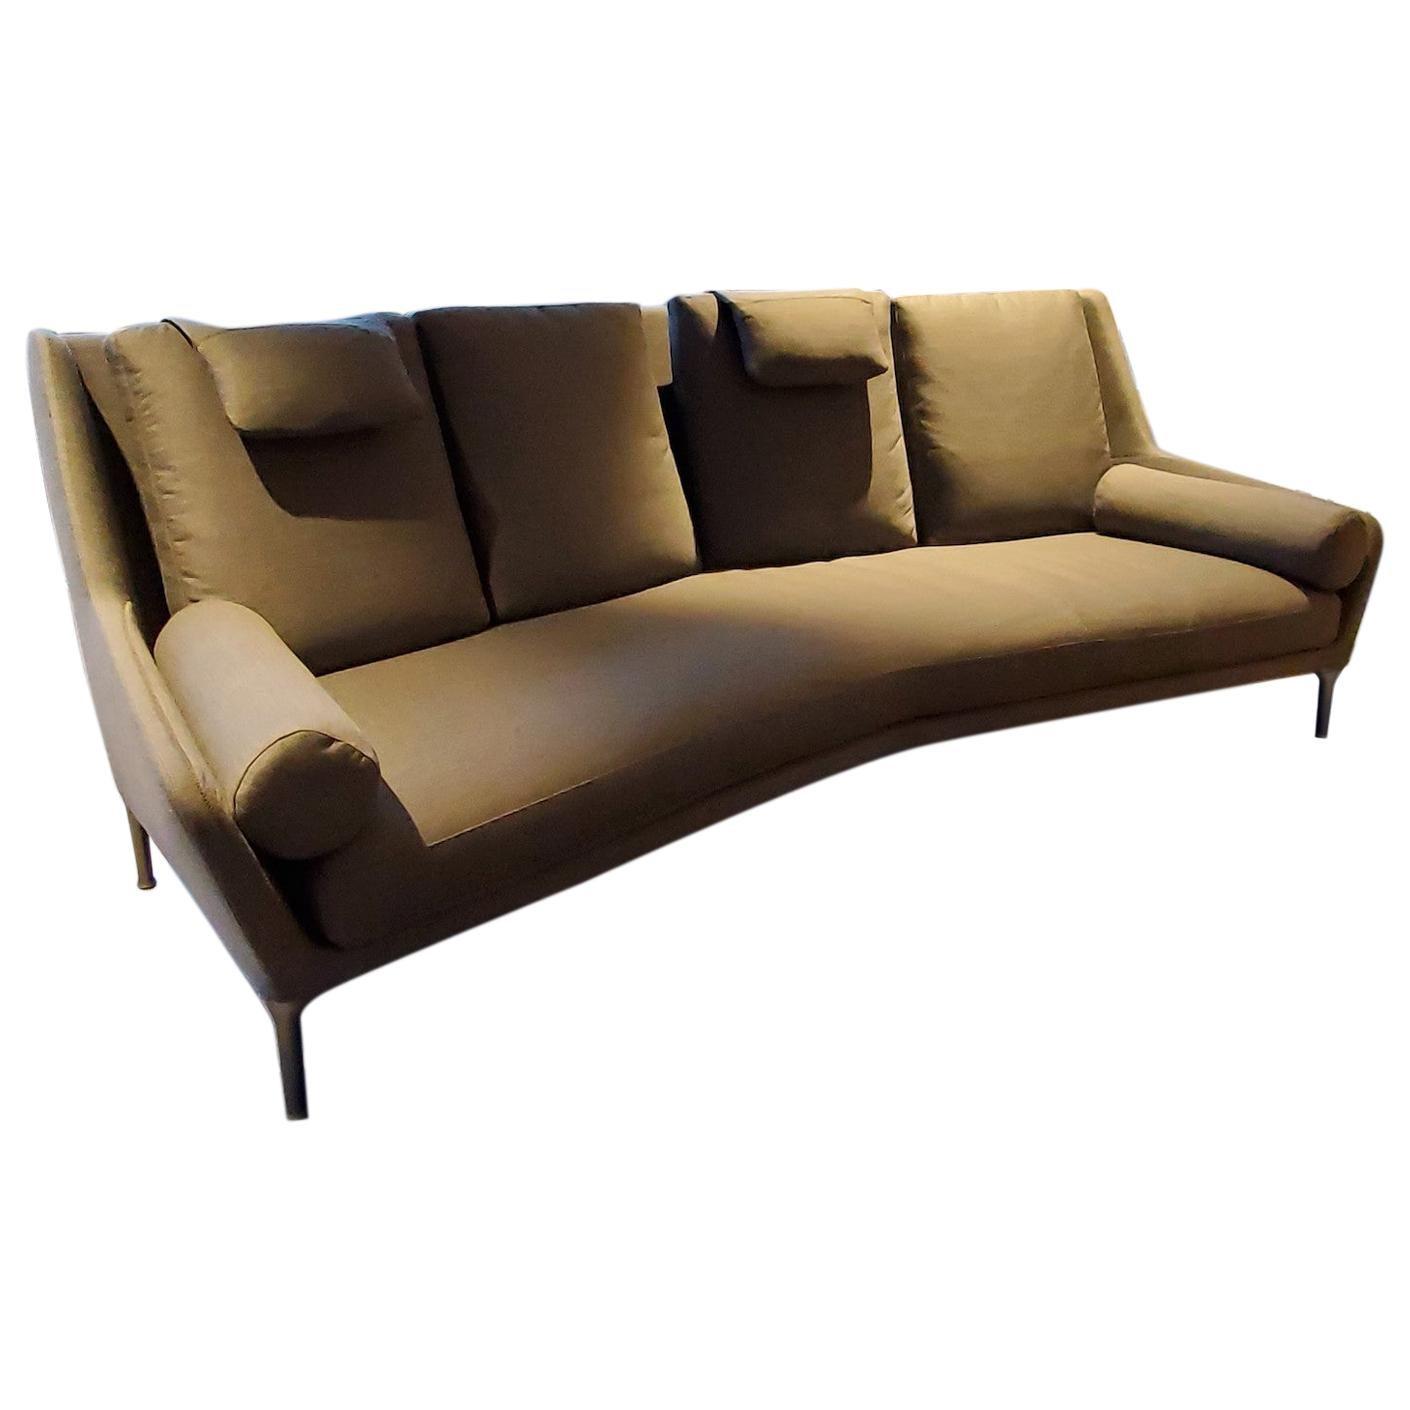 Édouard Fabric Sofa, by Antonio Citterio from B&B Italia